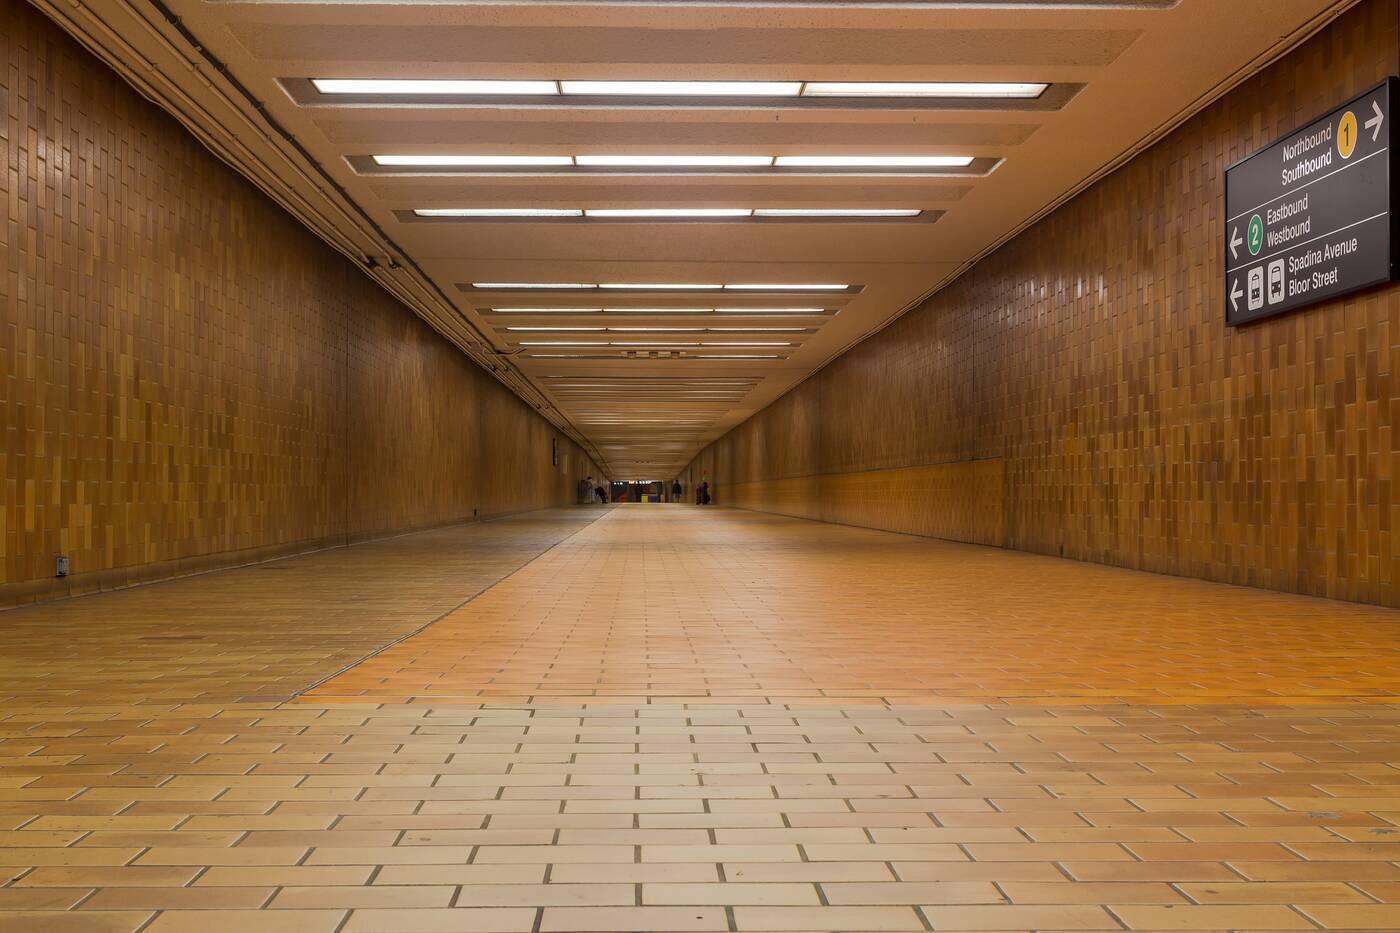 spadina station walkway